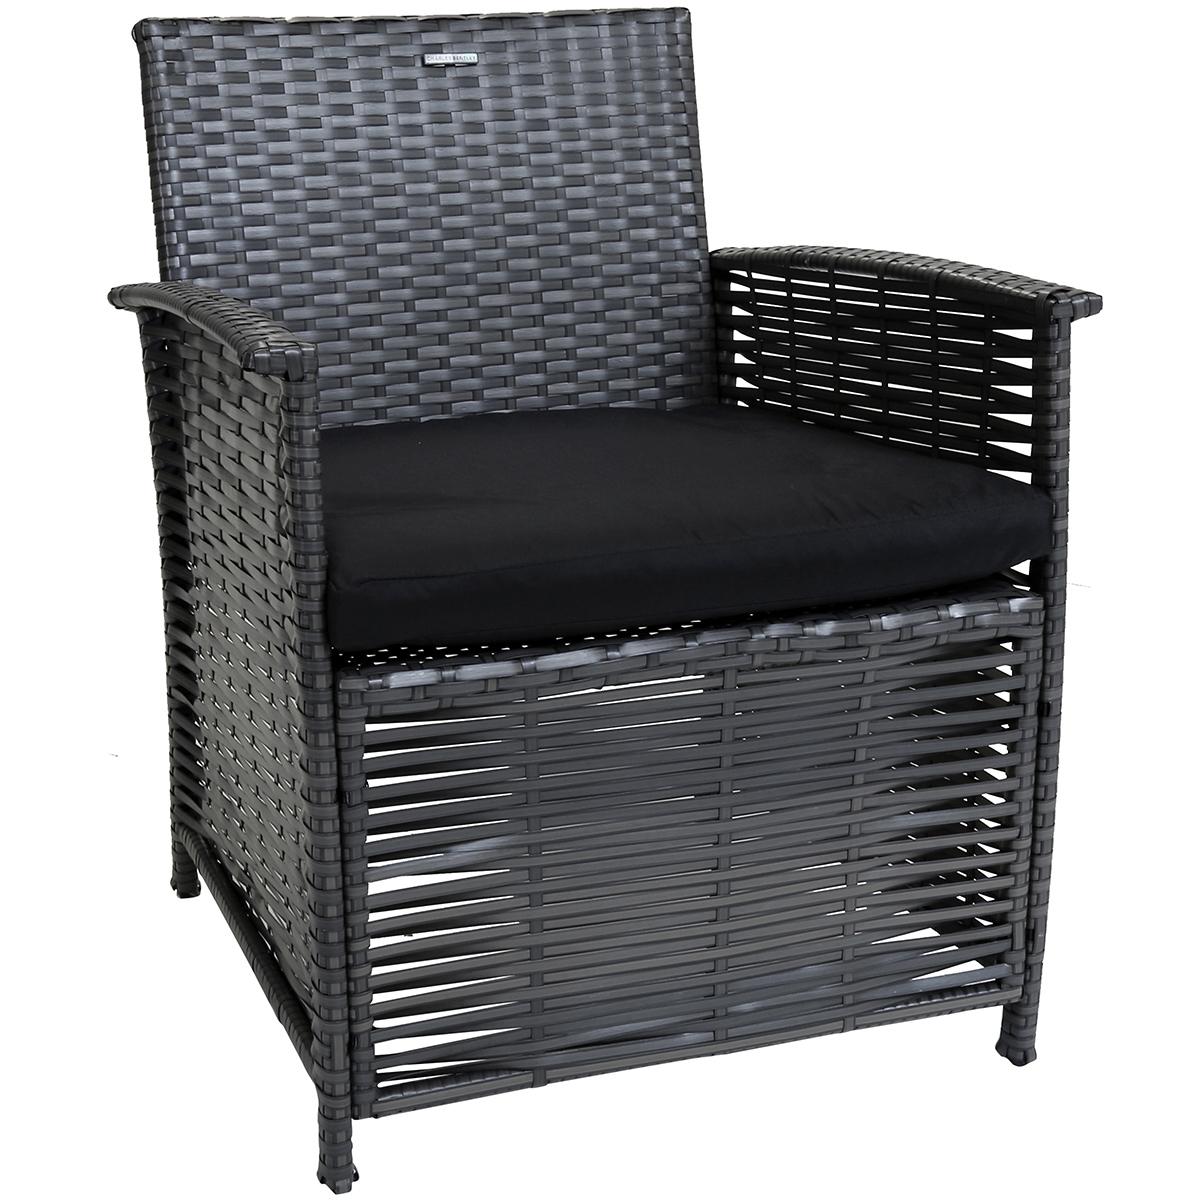 Terrific 4Pc Rattan Patio Dining Set Rattan Garden Furniture Sets Evergreenethics Interior Chair Design Evergreenethicsorg